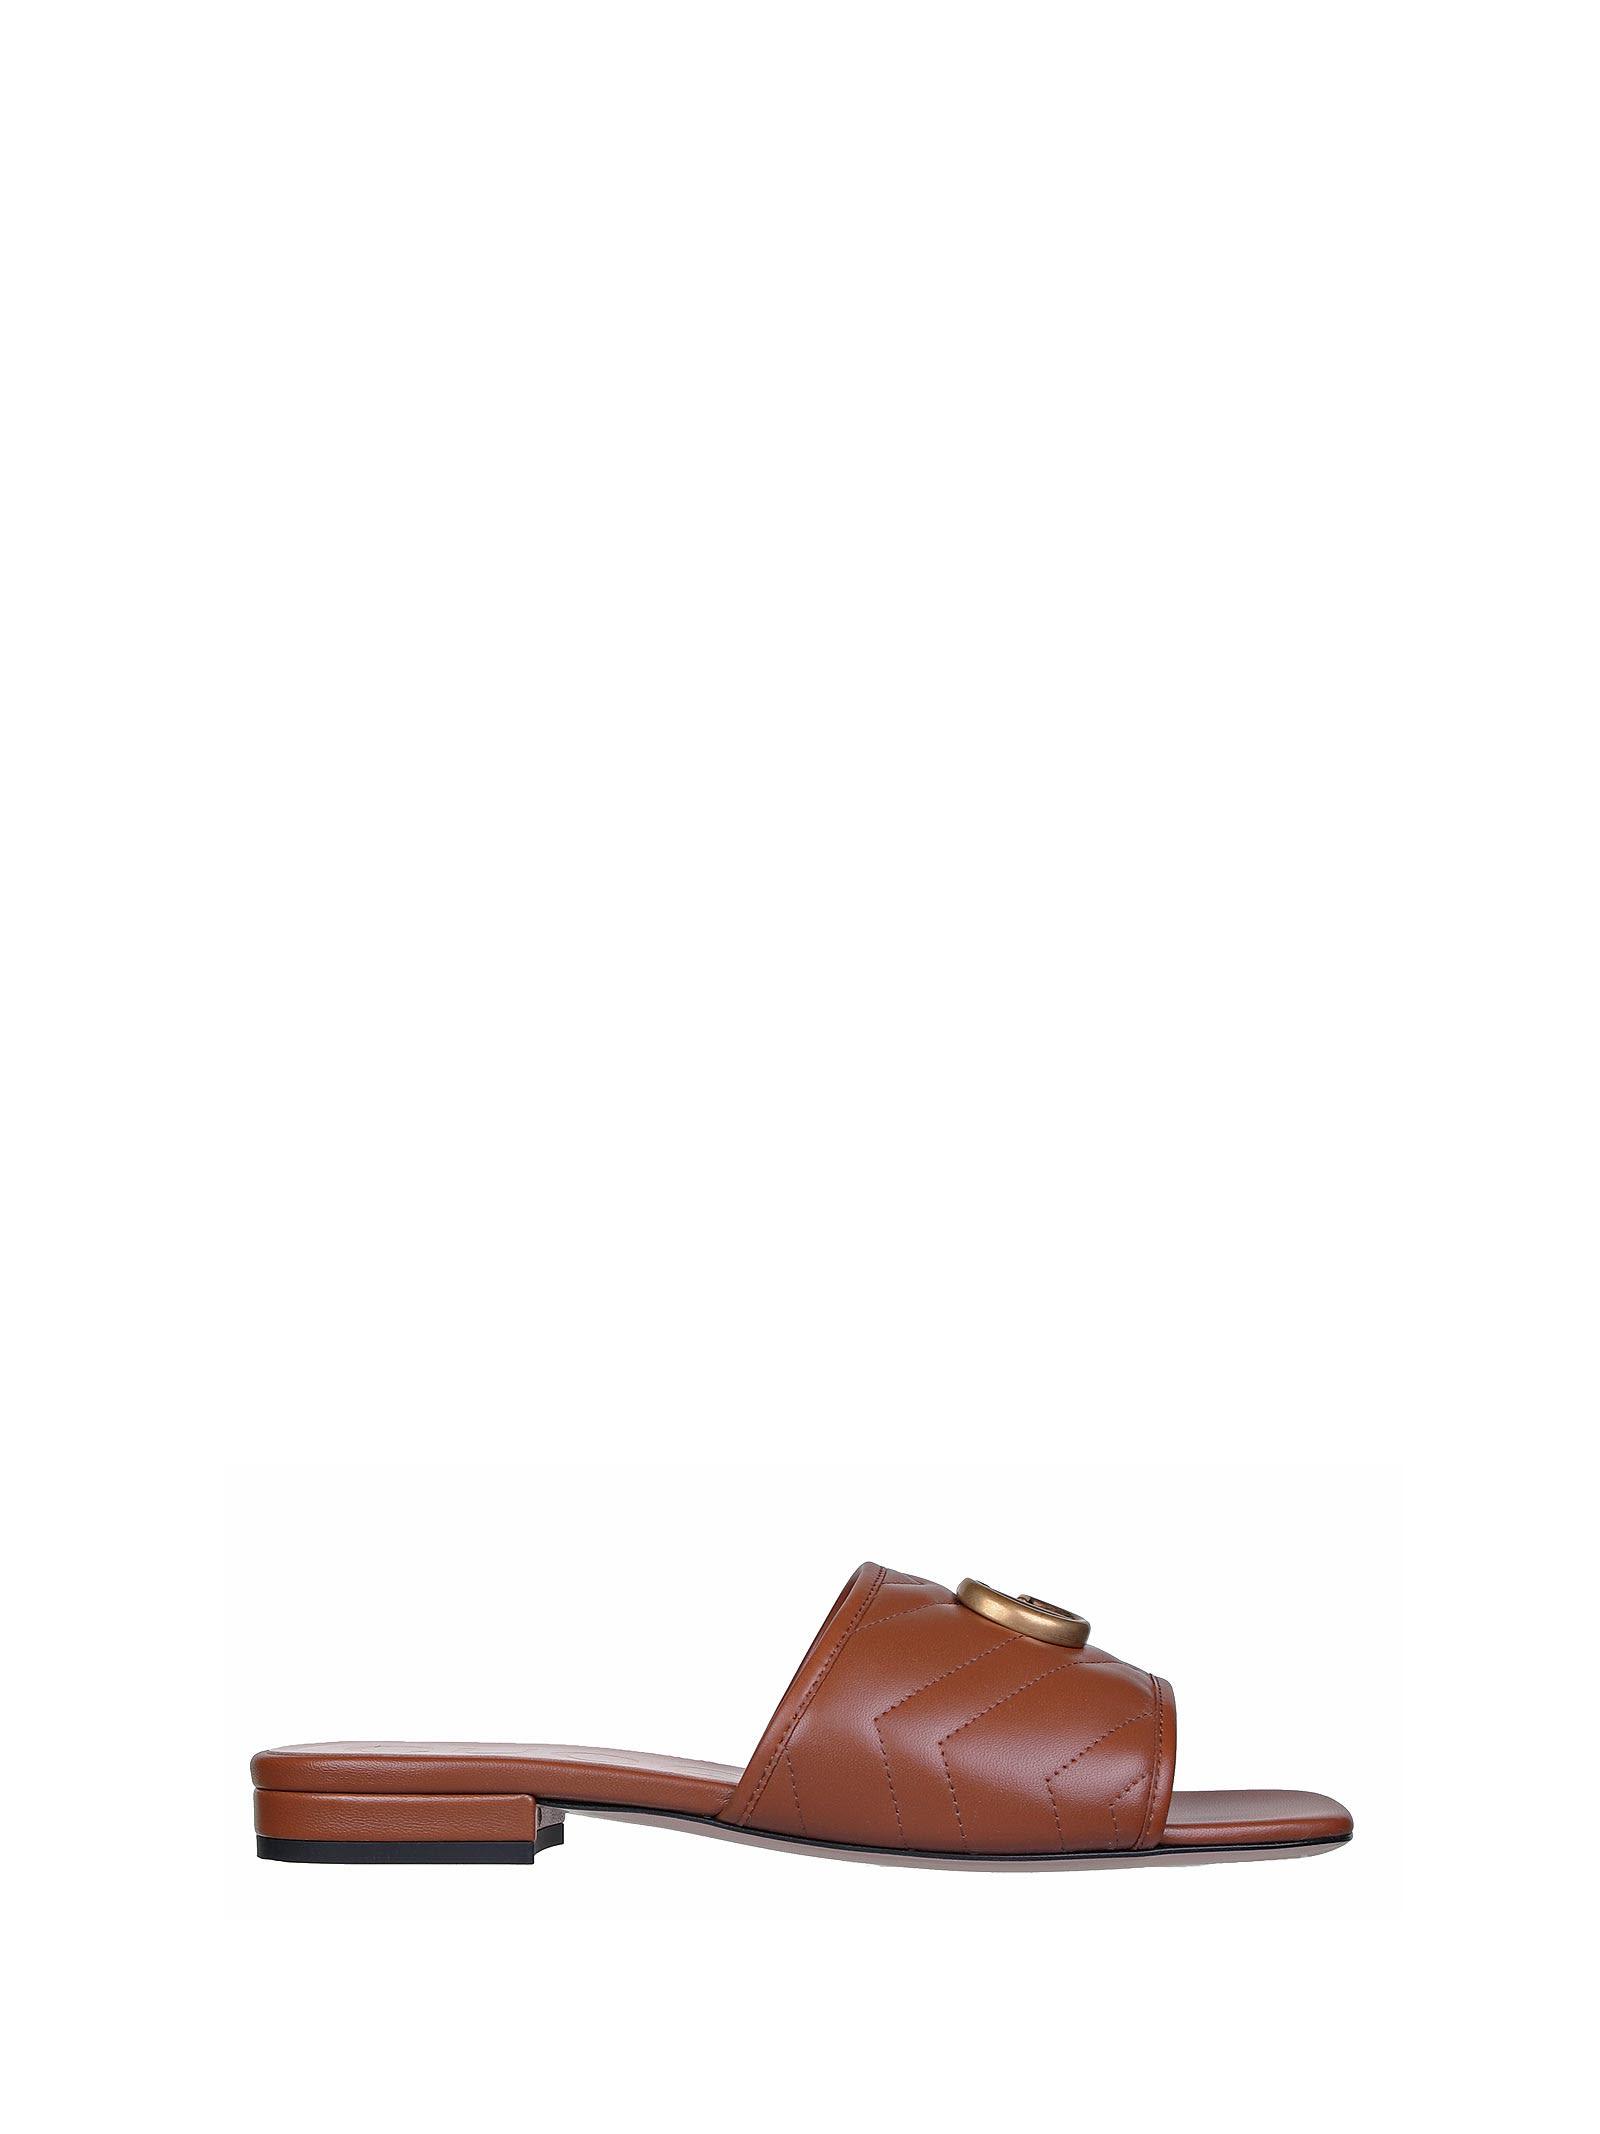 Gucci Gucci Double G Sandals